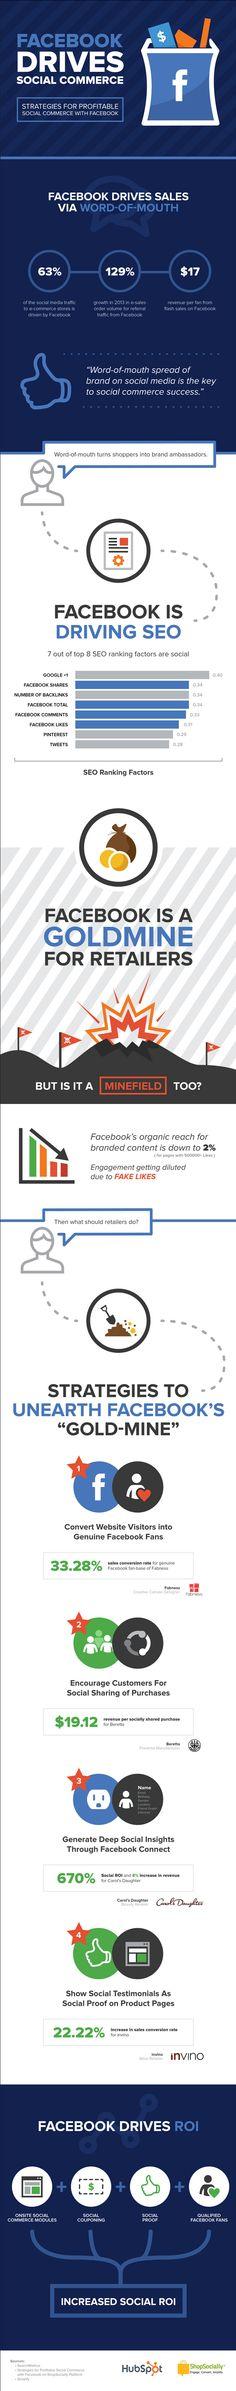 Facebook Drives Social Commerce